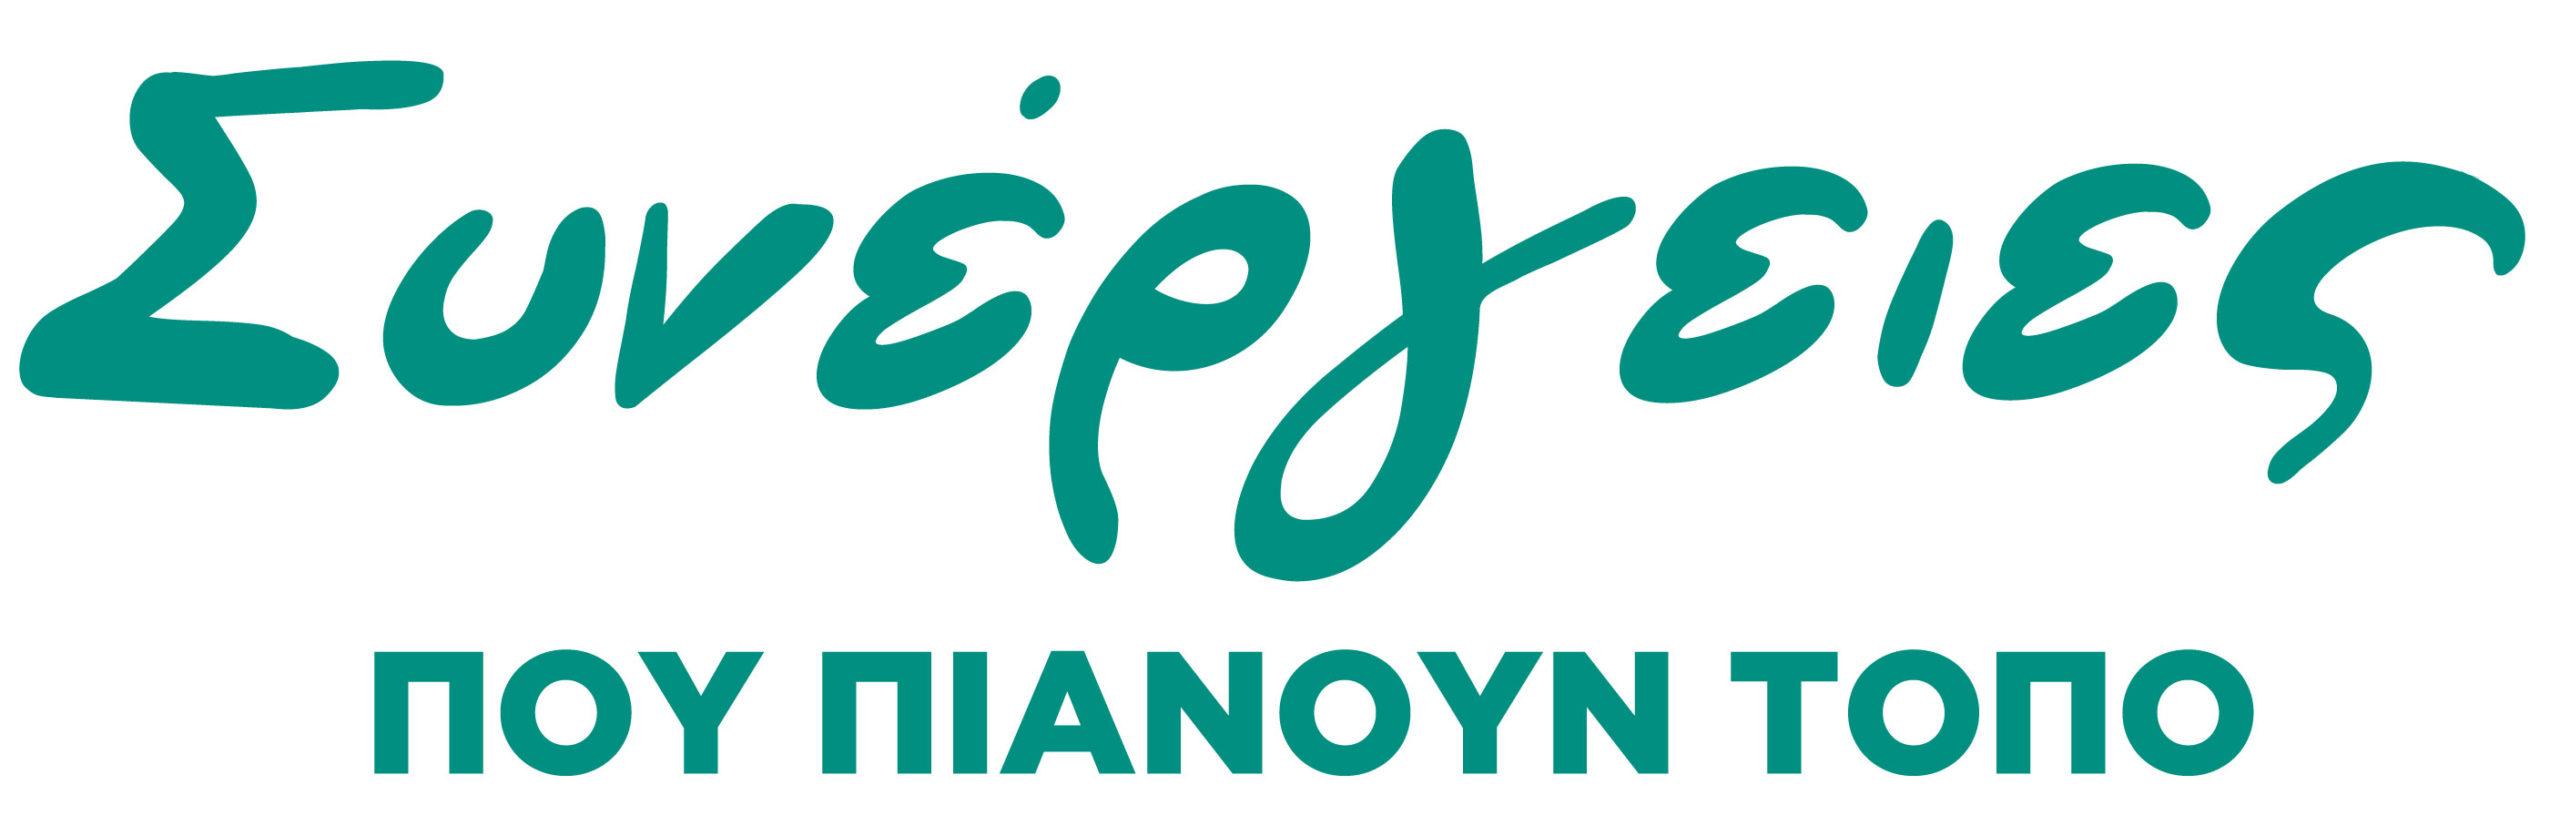 HERACLES Synergeies Logo Green